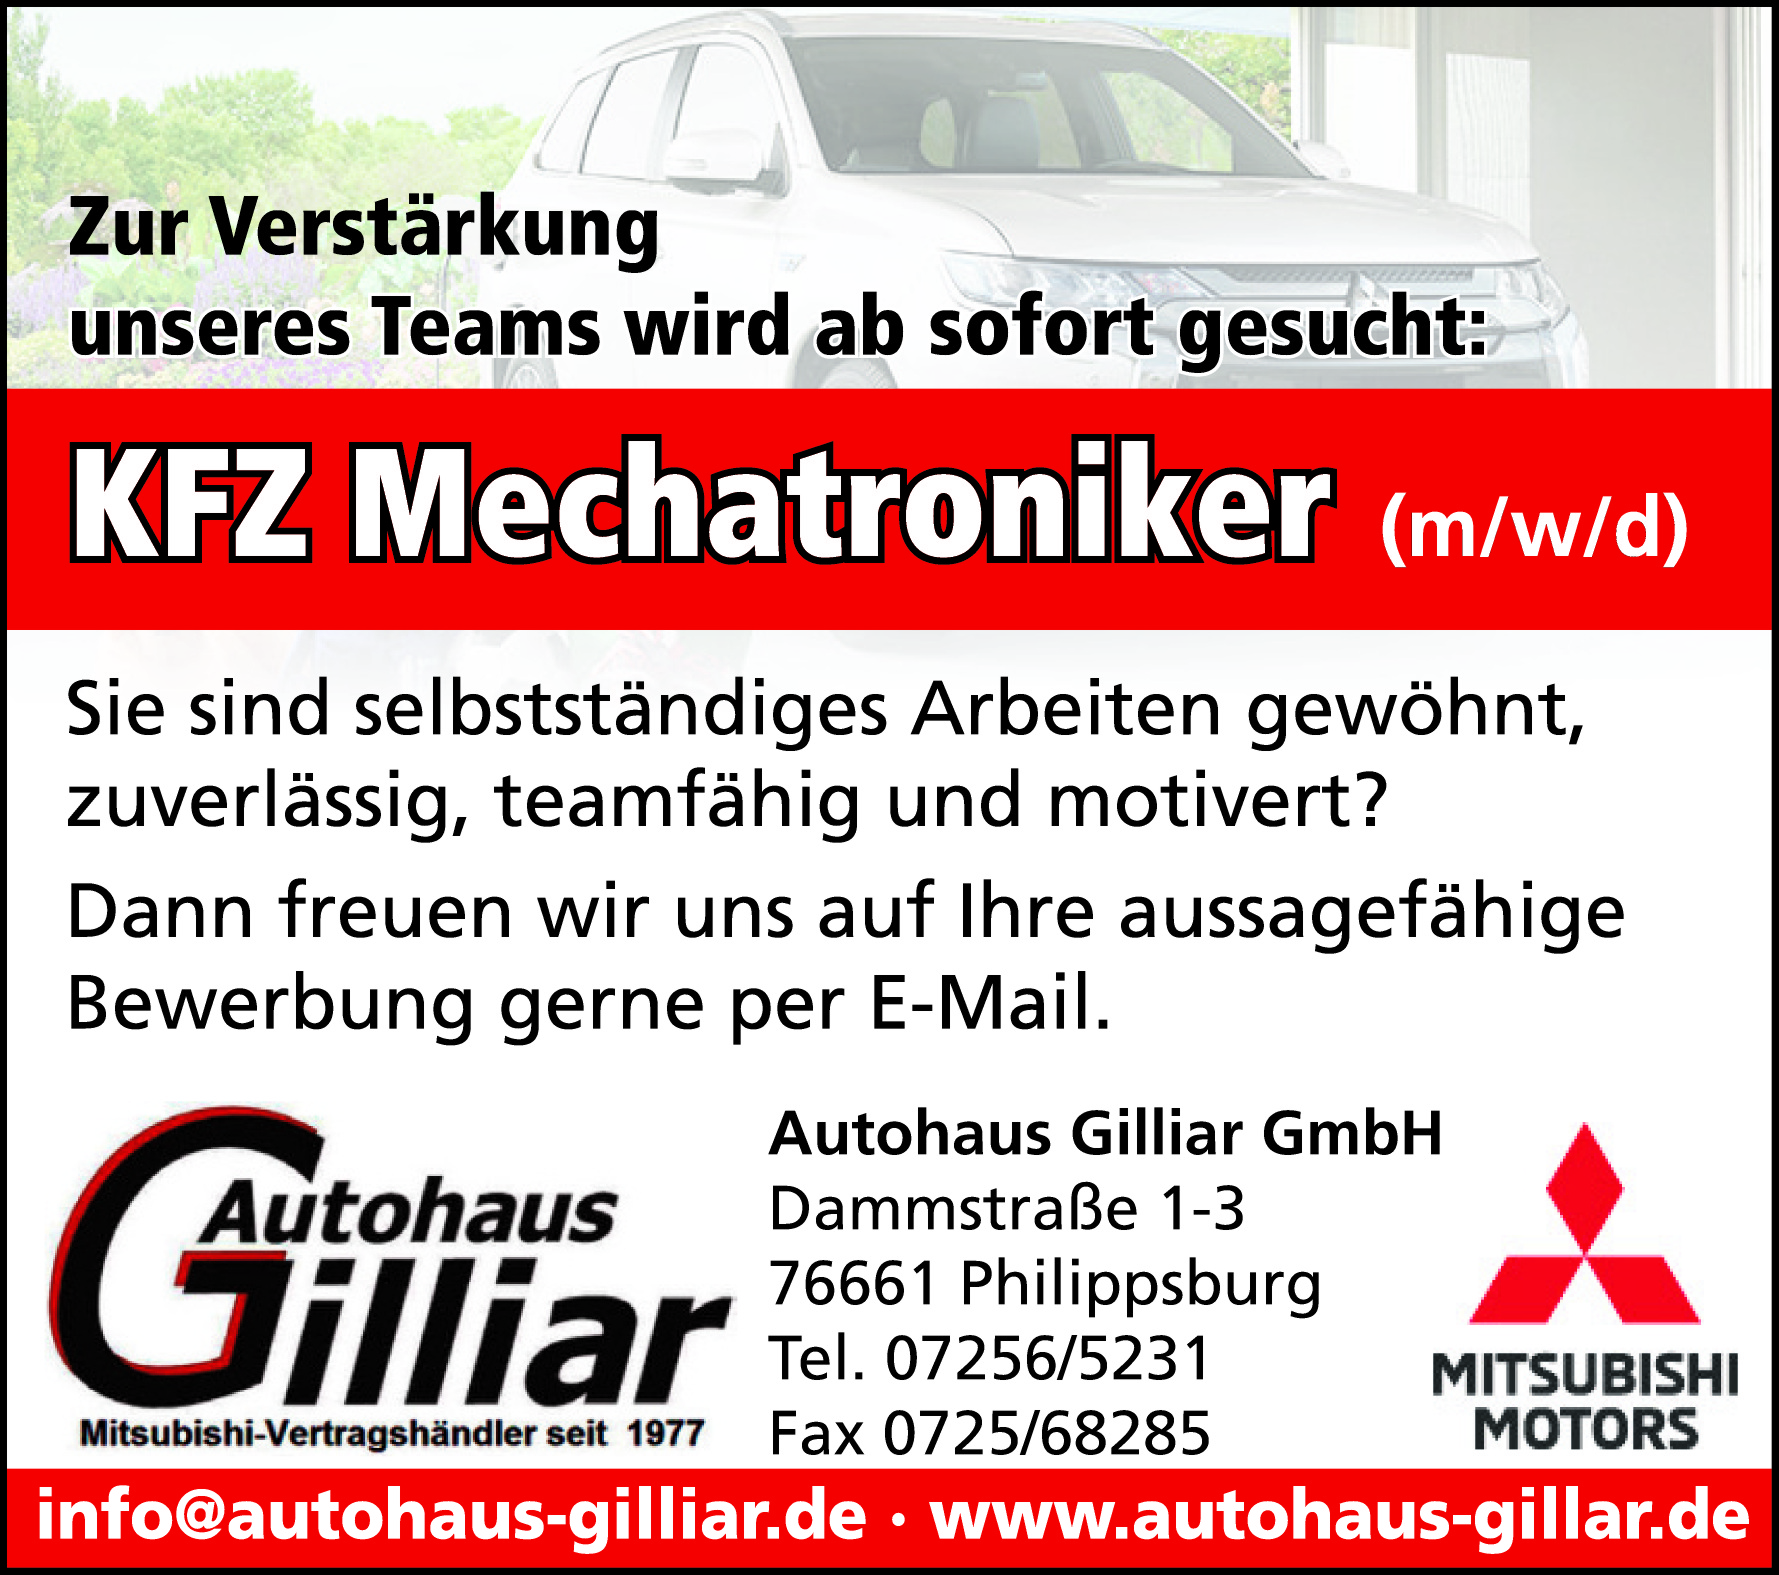 Autohaus Gilliar